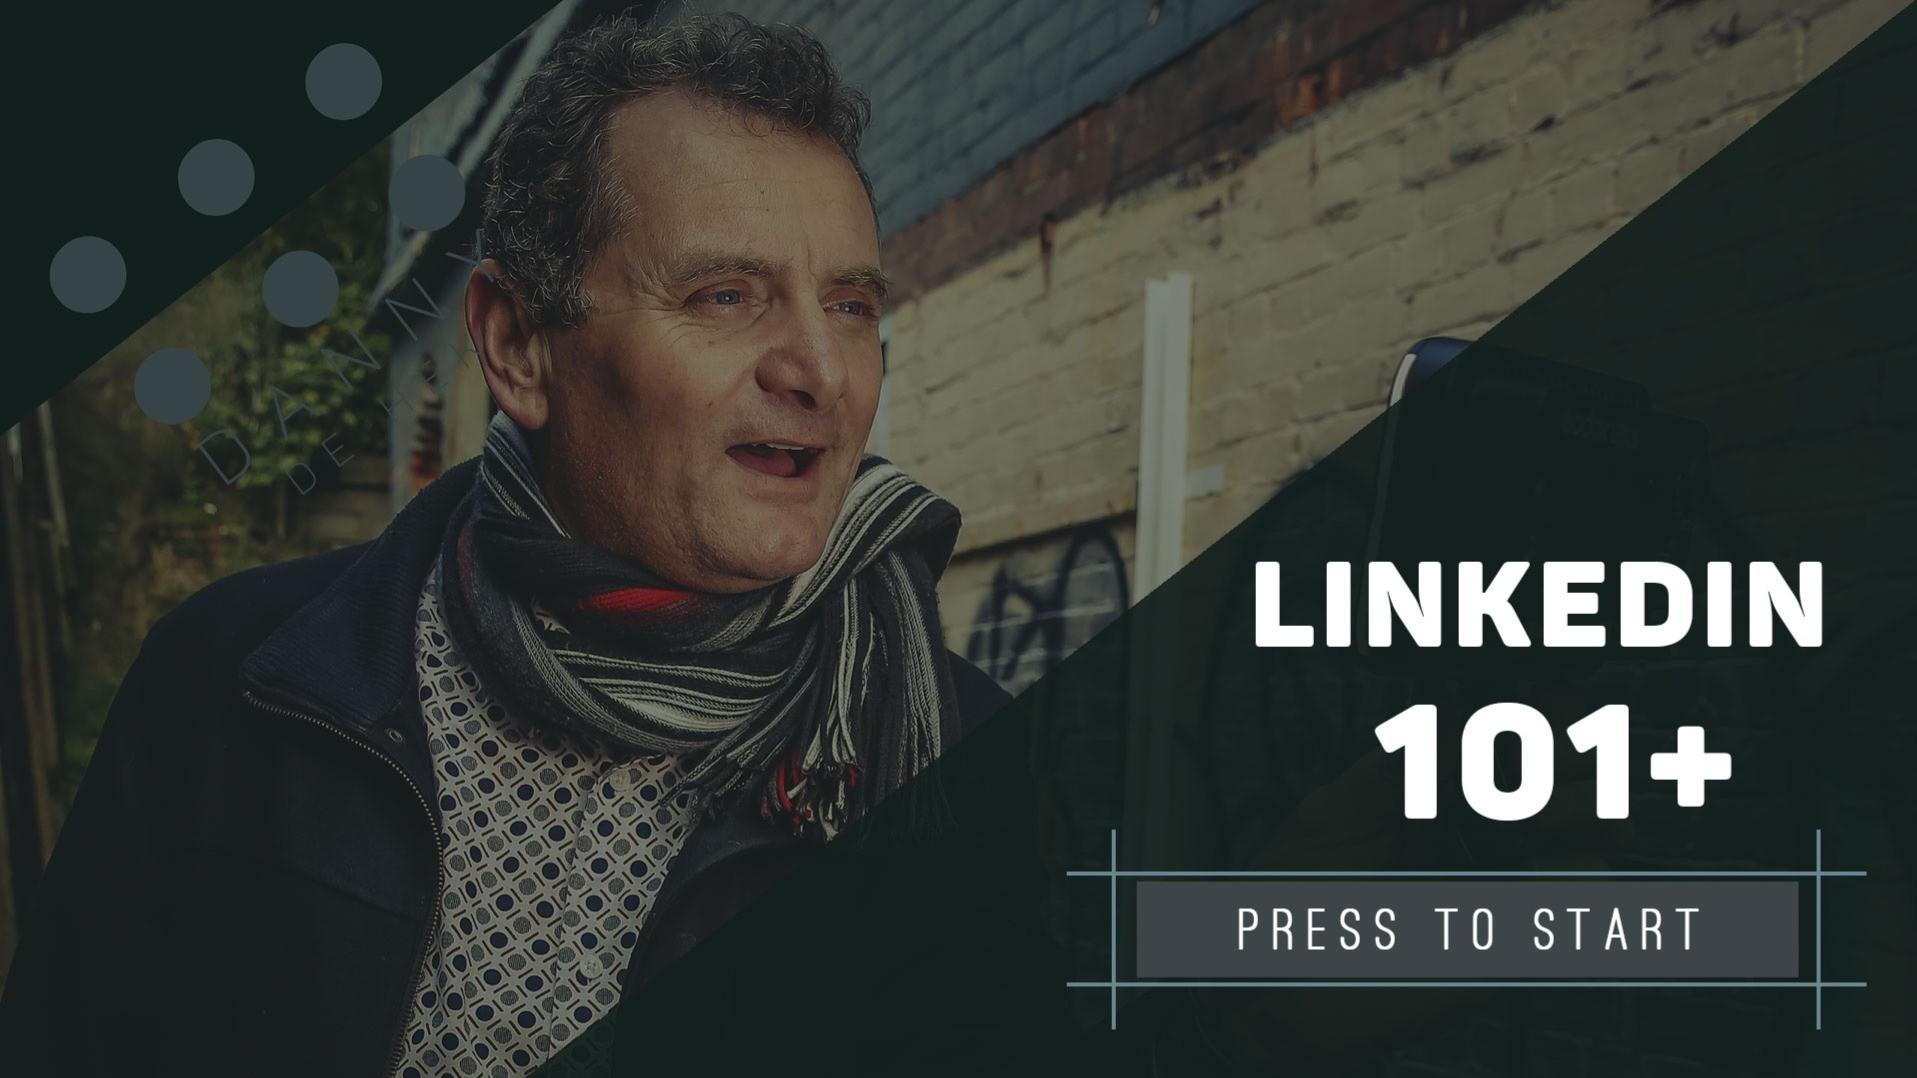 AppSumo Deal for Linkedin 101+